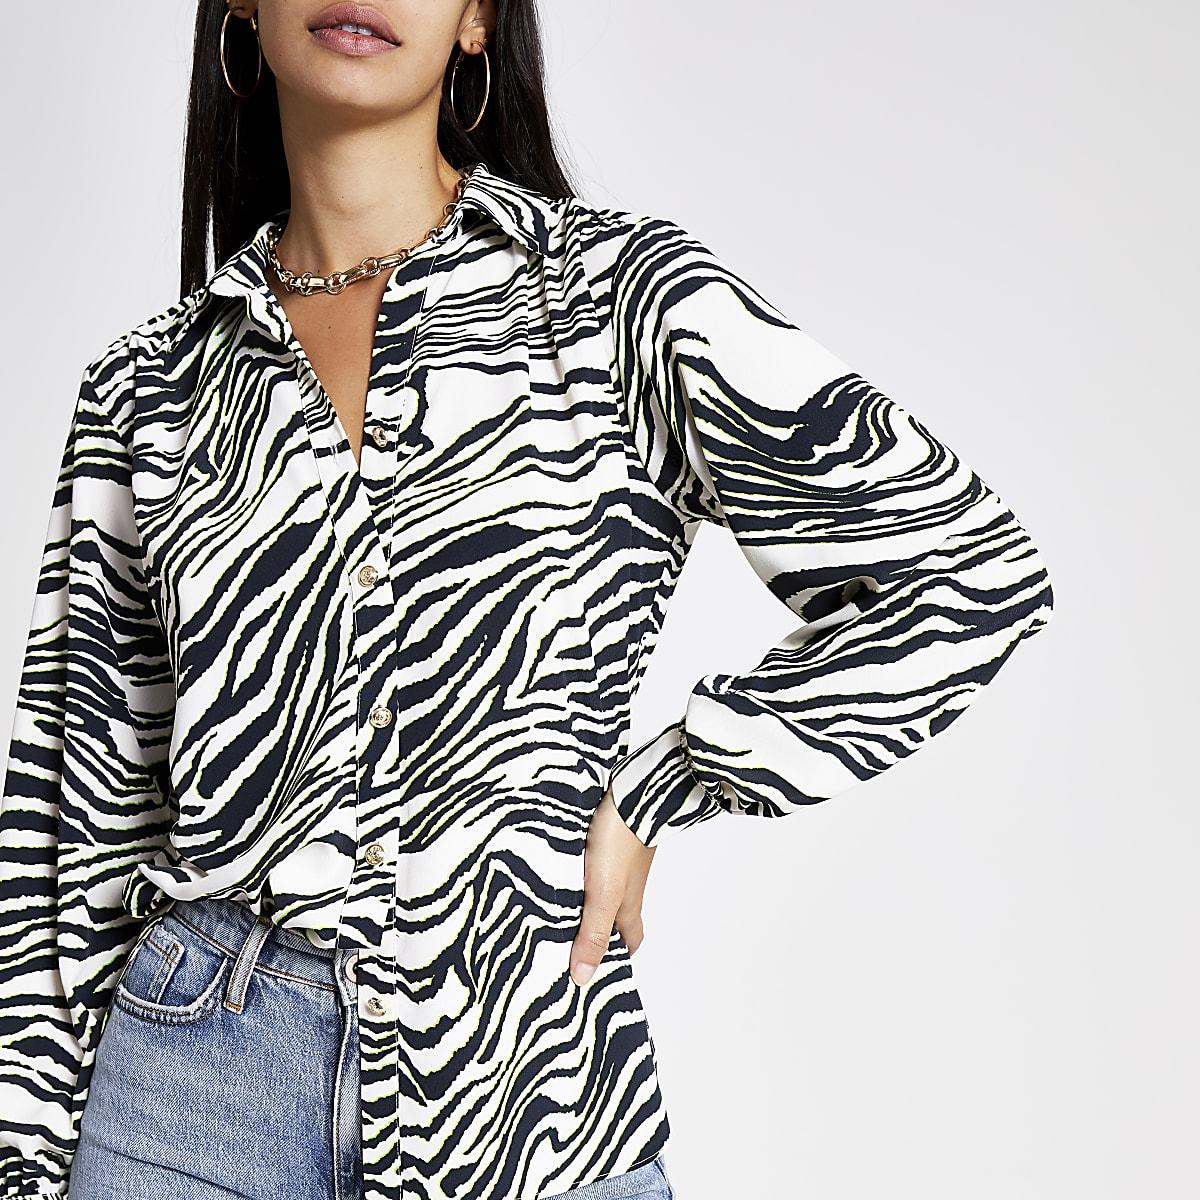 Crème utility-overhemd met zebraprint